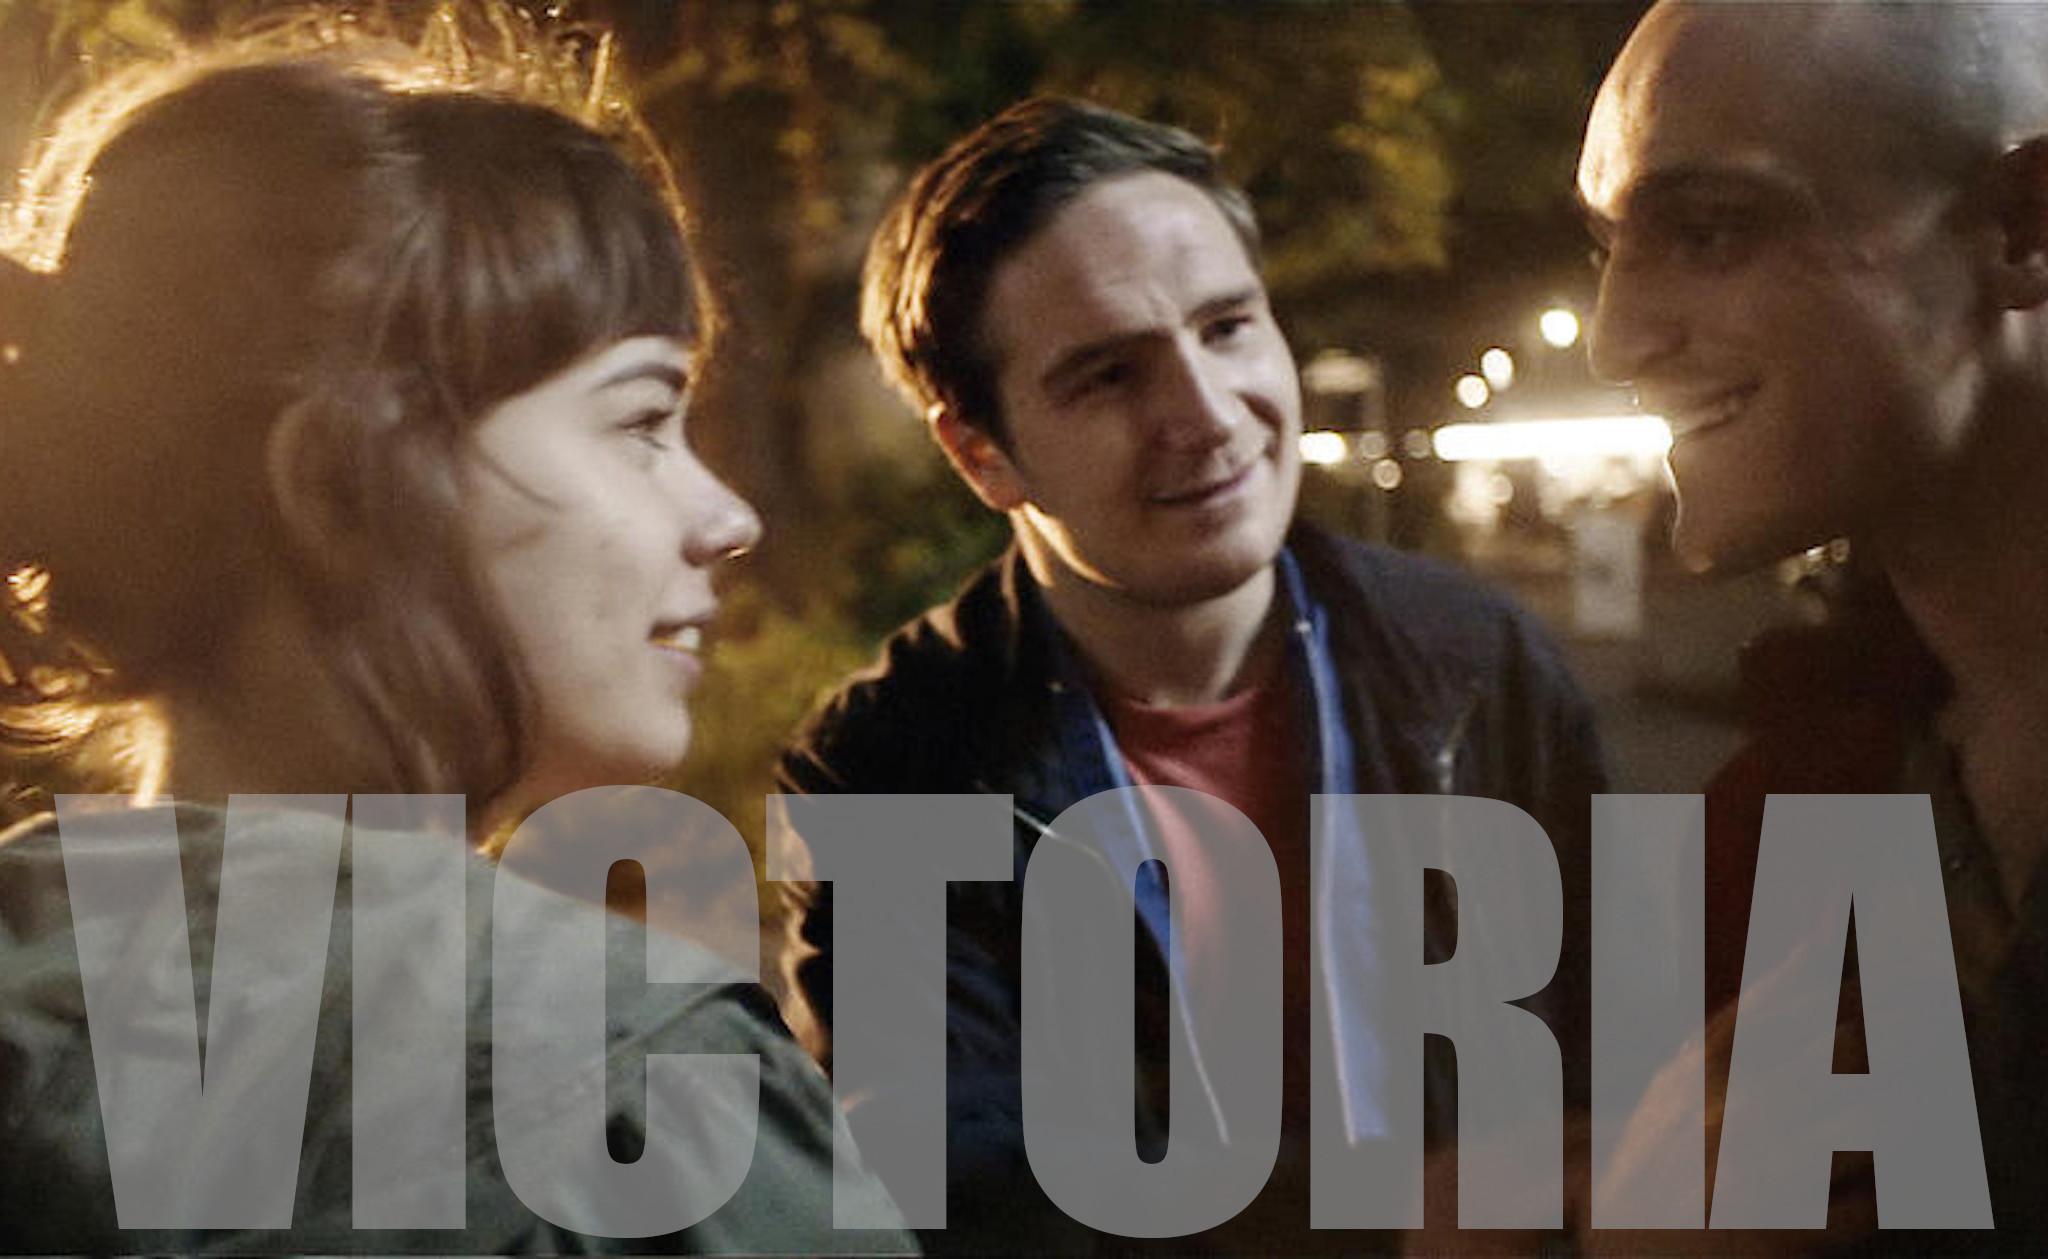 jugendkulturjahr-2020-ratingen-jkj2020-filmnacht-booksmart-victoria